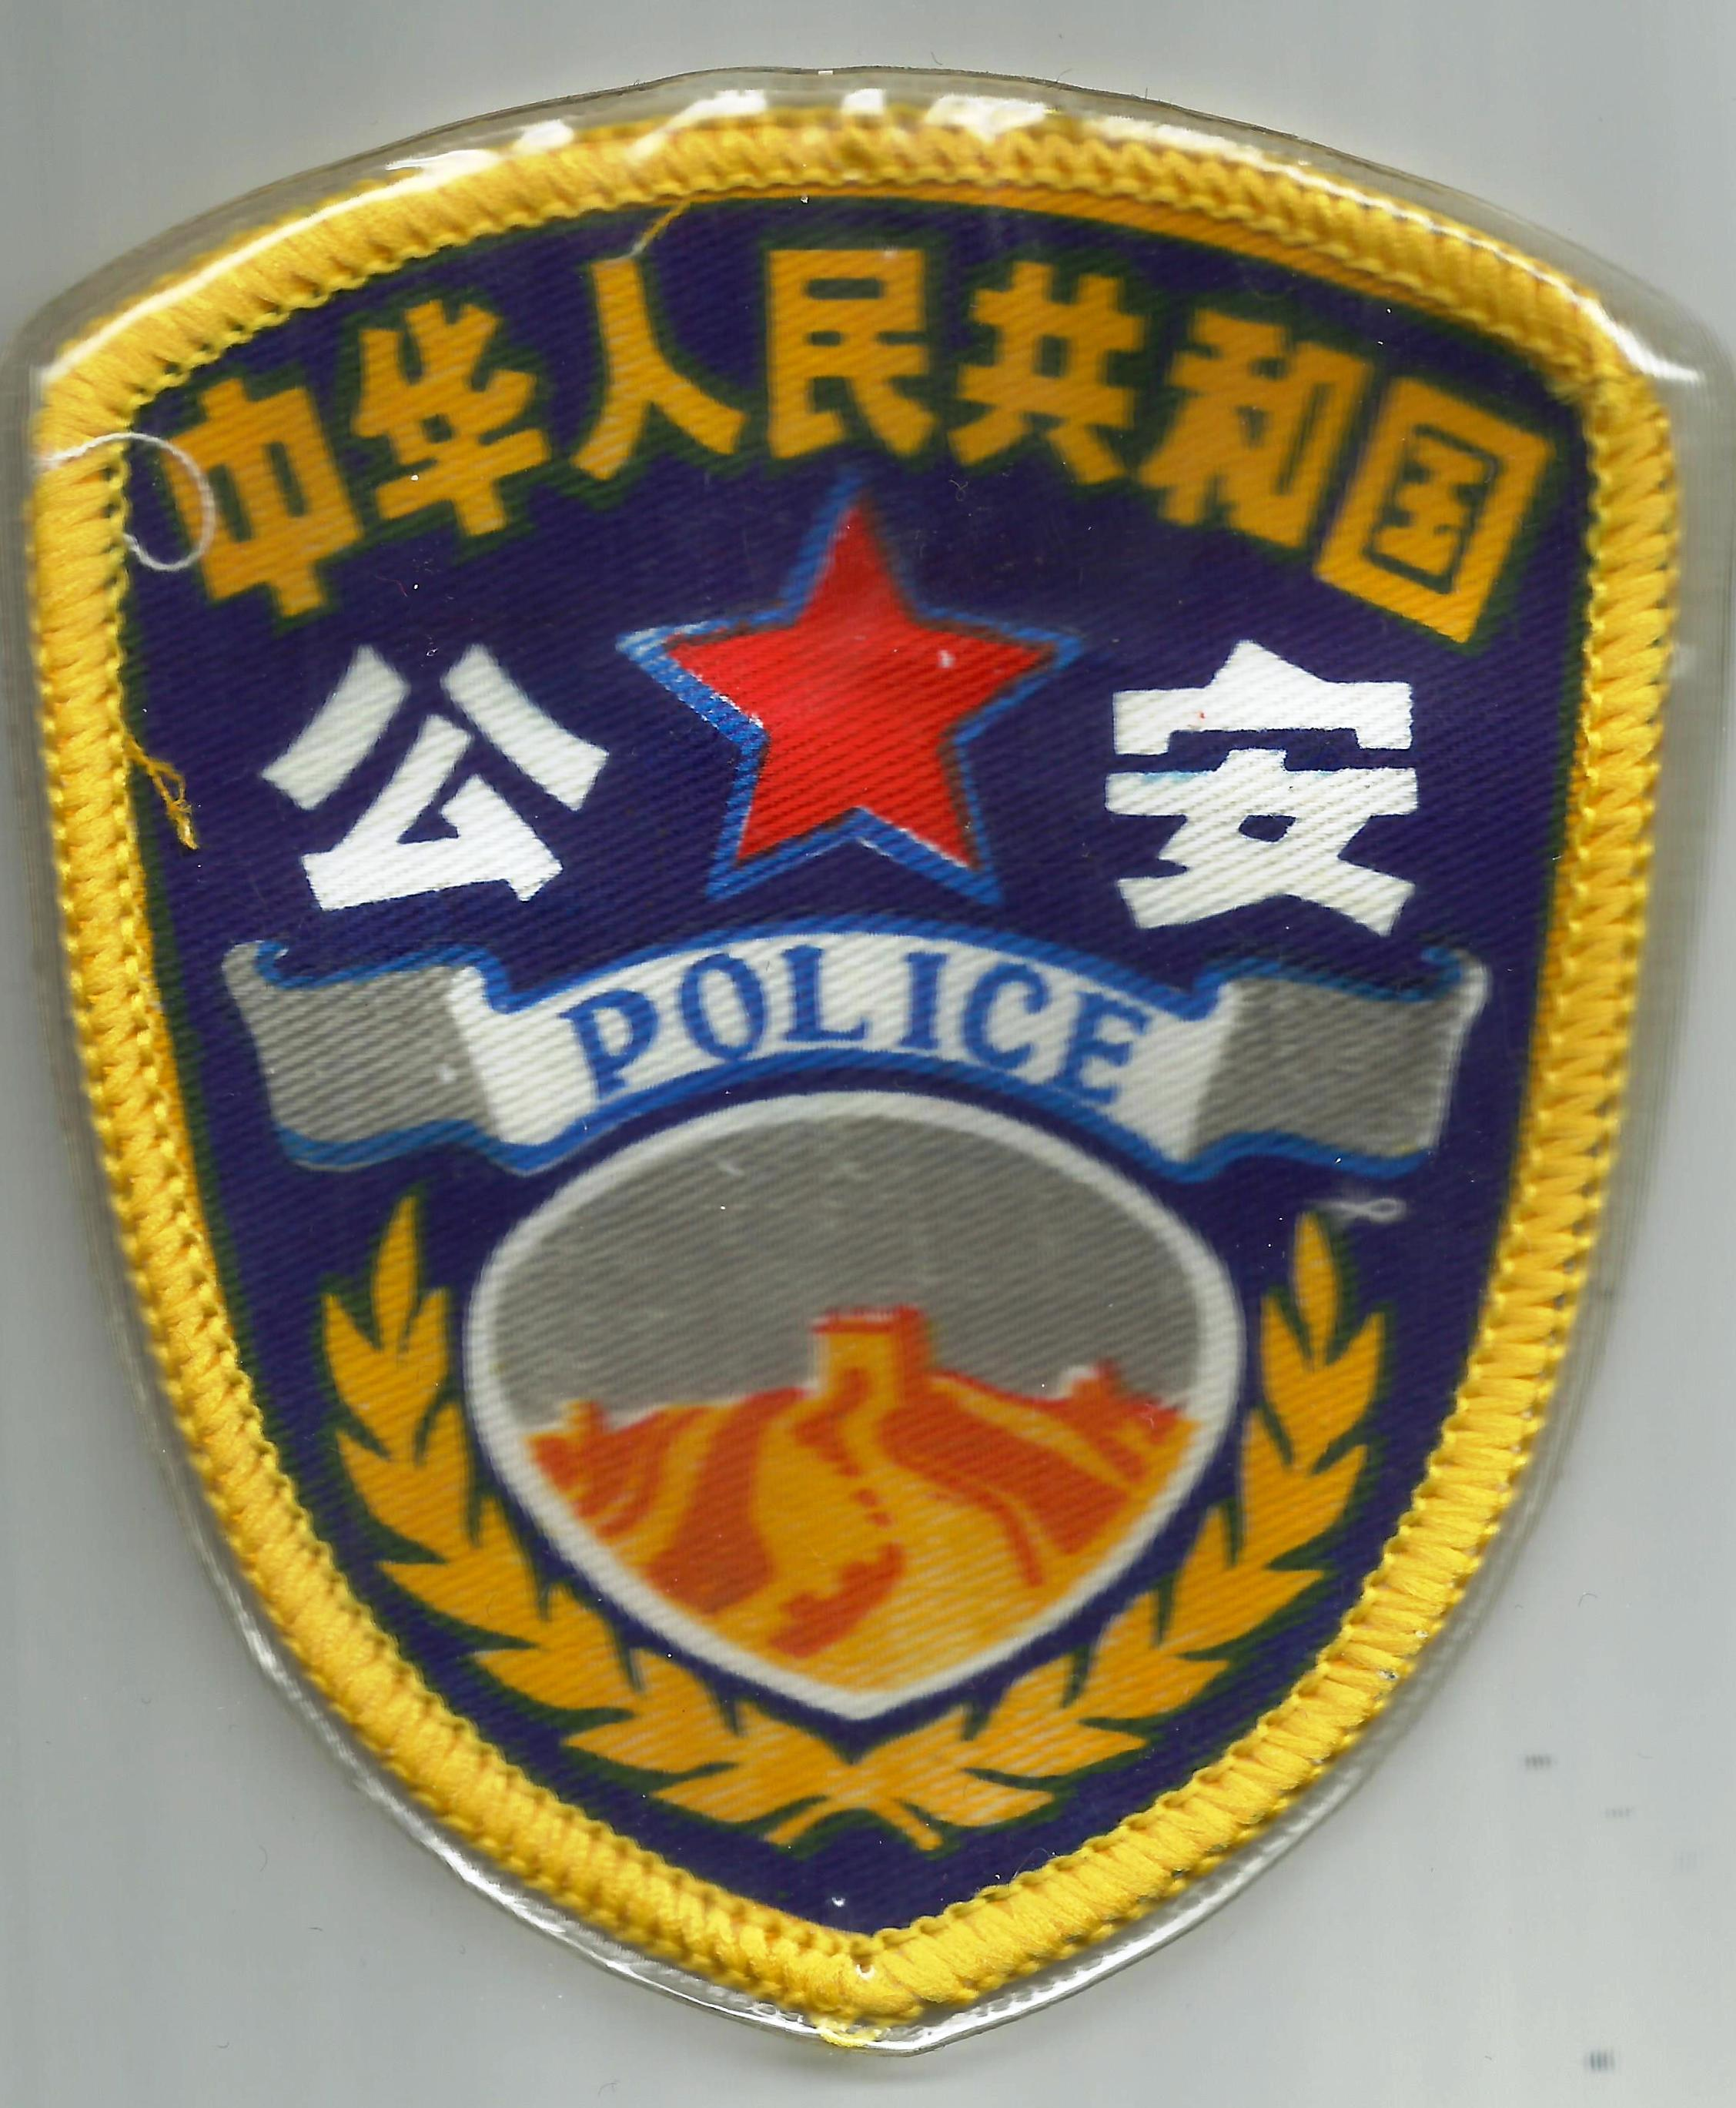 China Police: File:China Police Patch 01.jpg